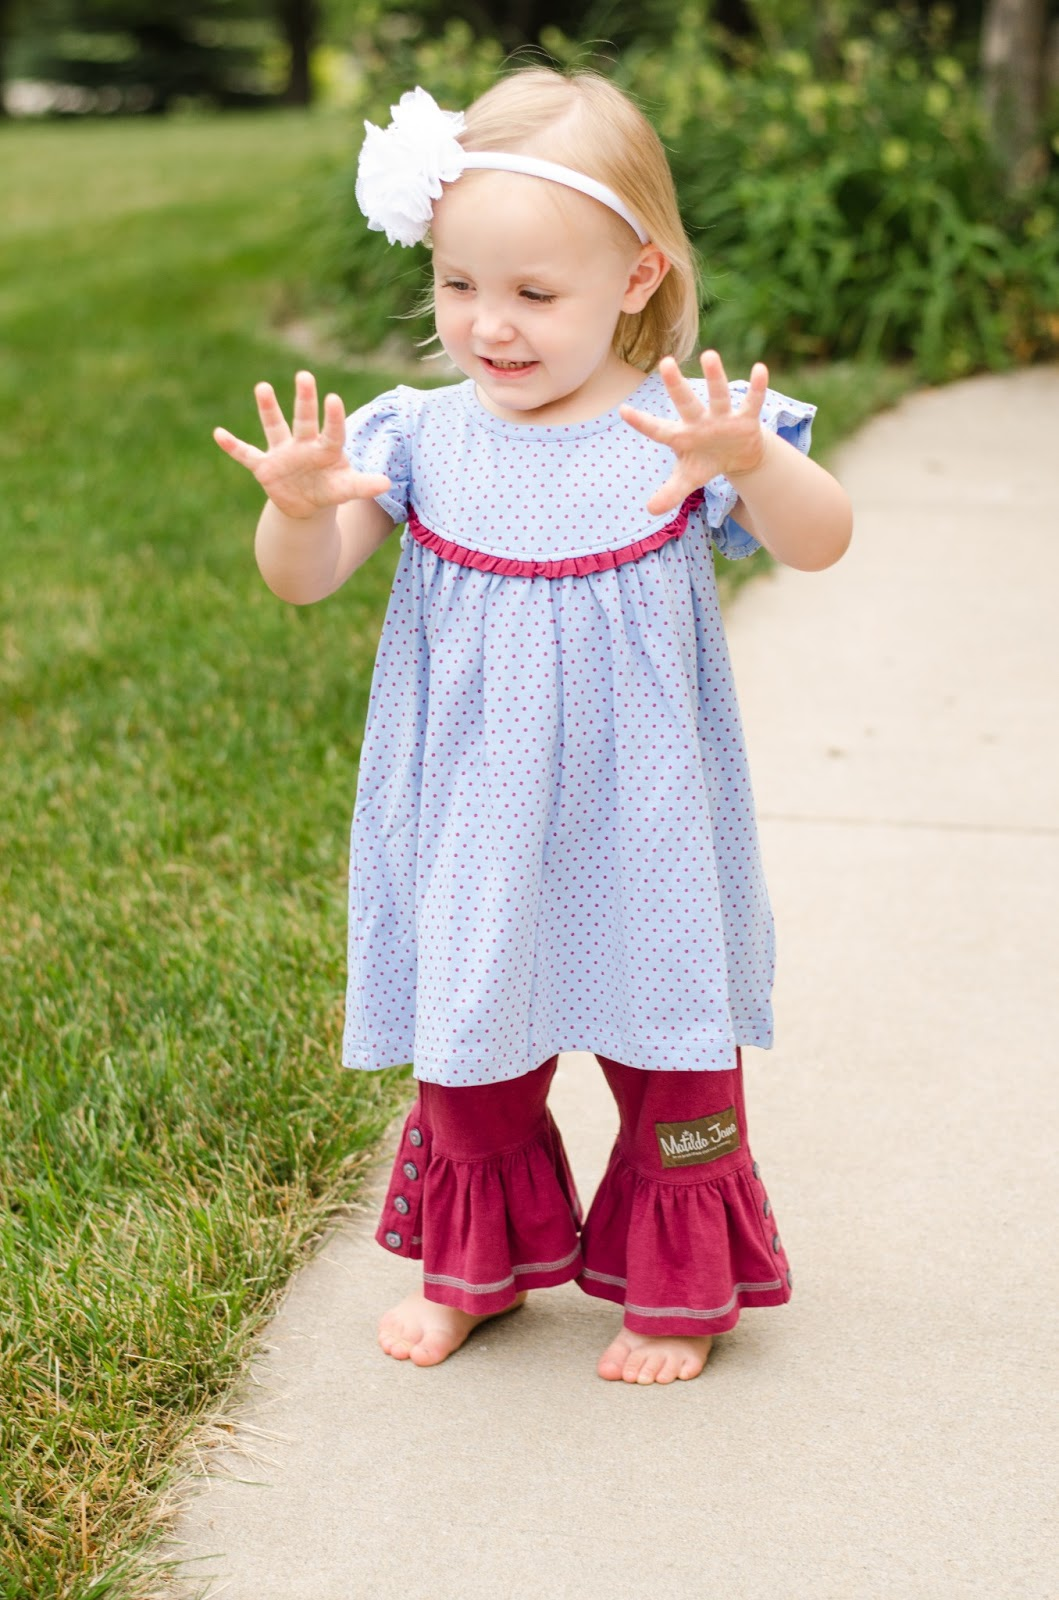 b8a084718bb3e Girls Just Wanna Have Fun!: Matilda Jane-- Trendy Tot Tuesday